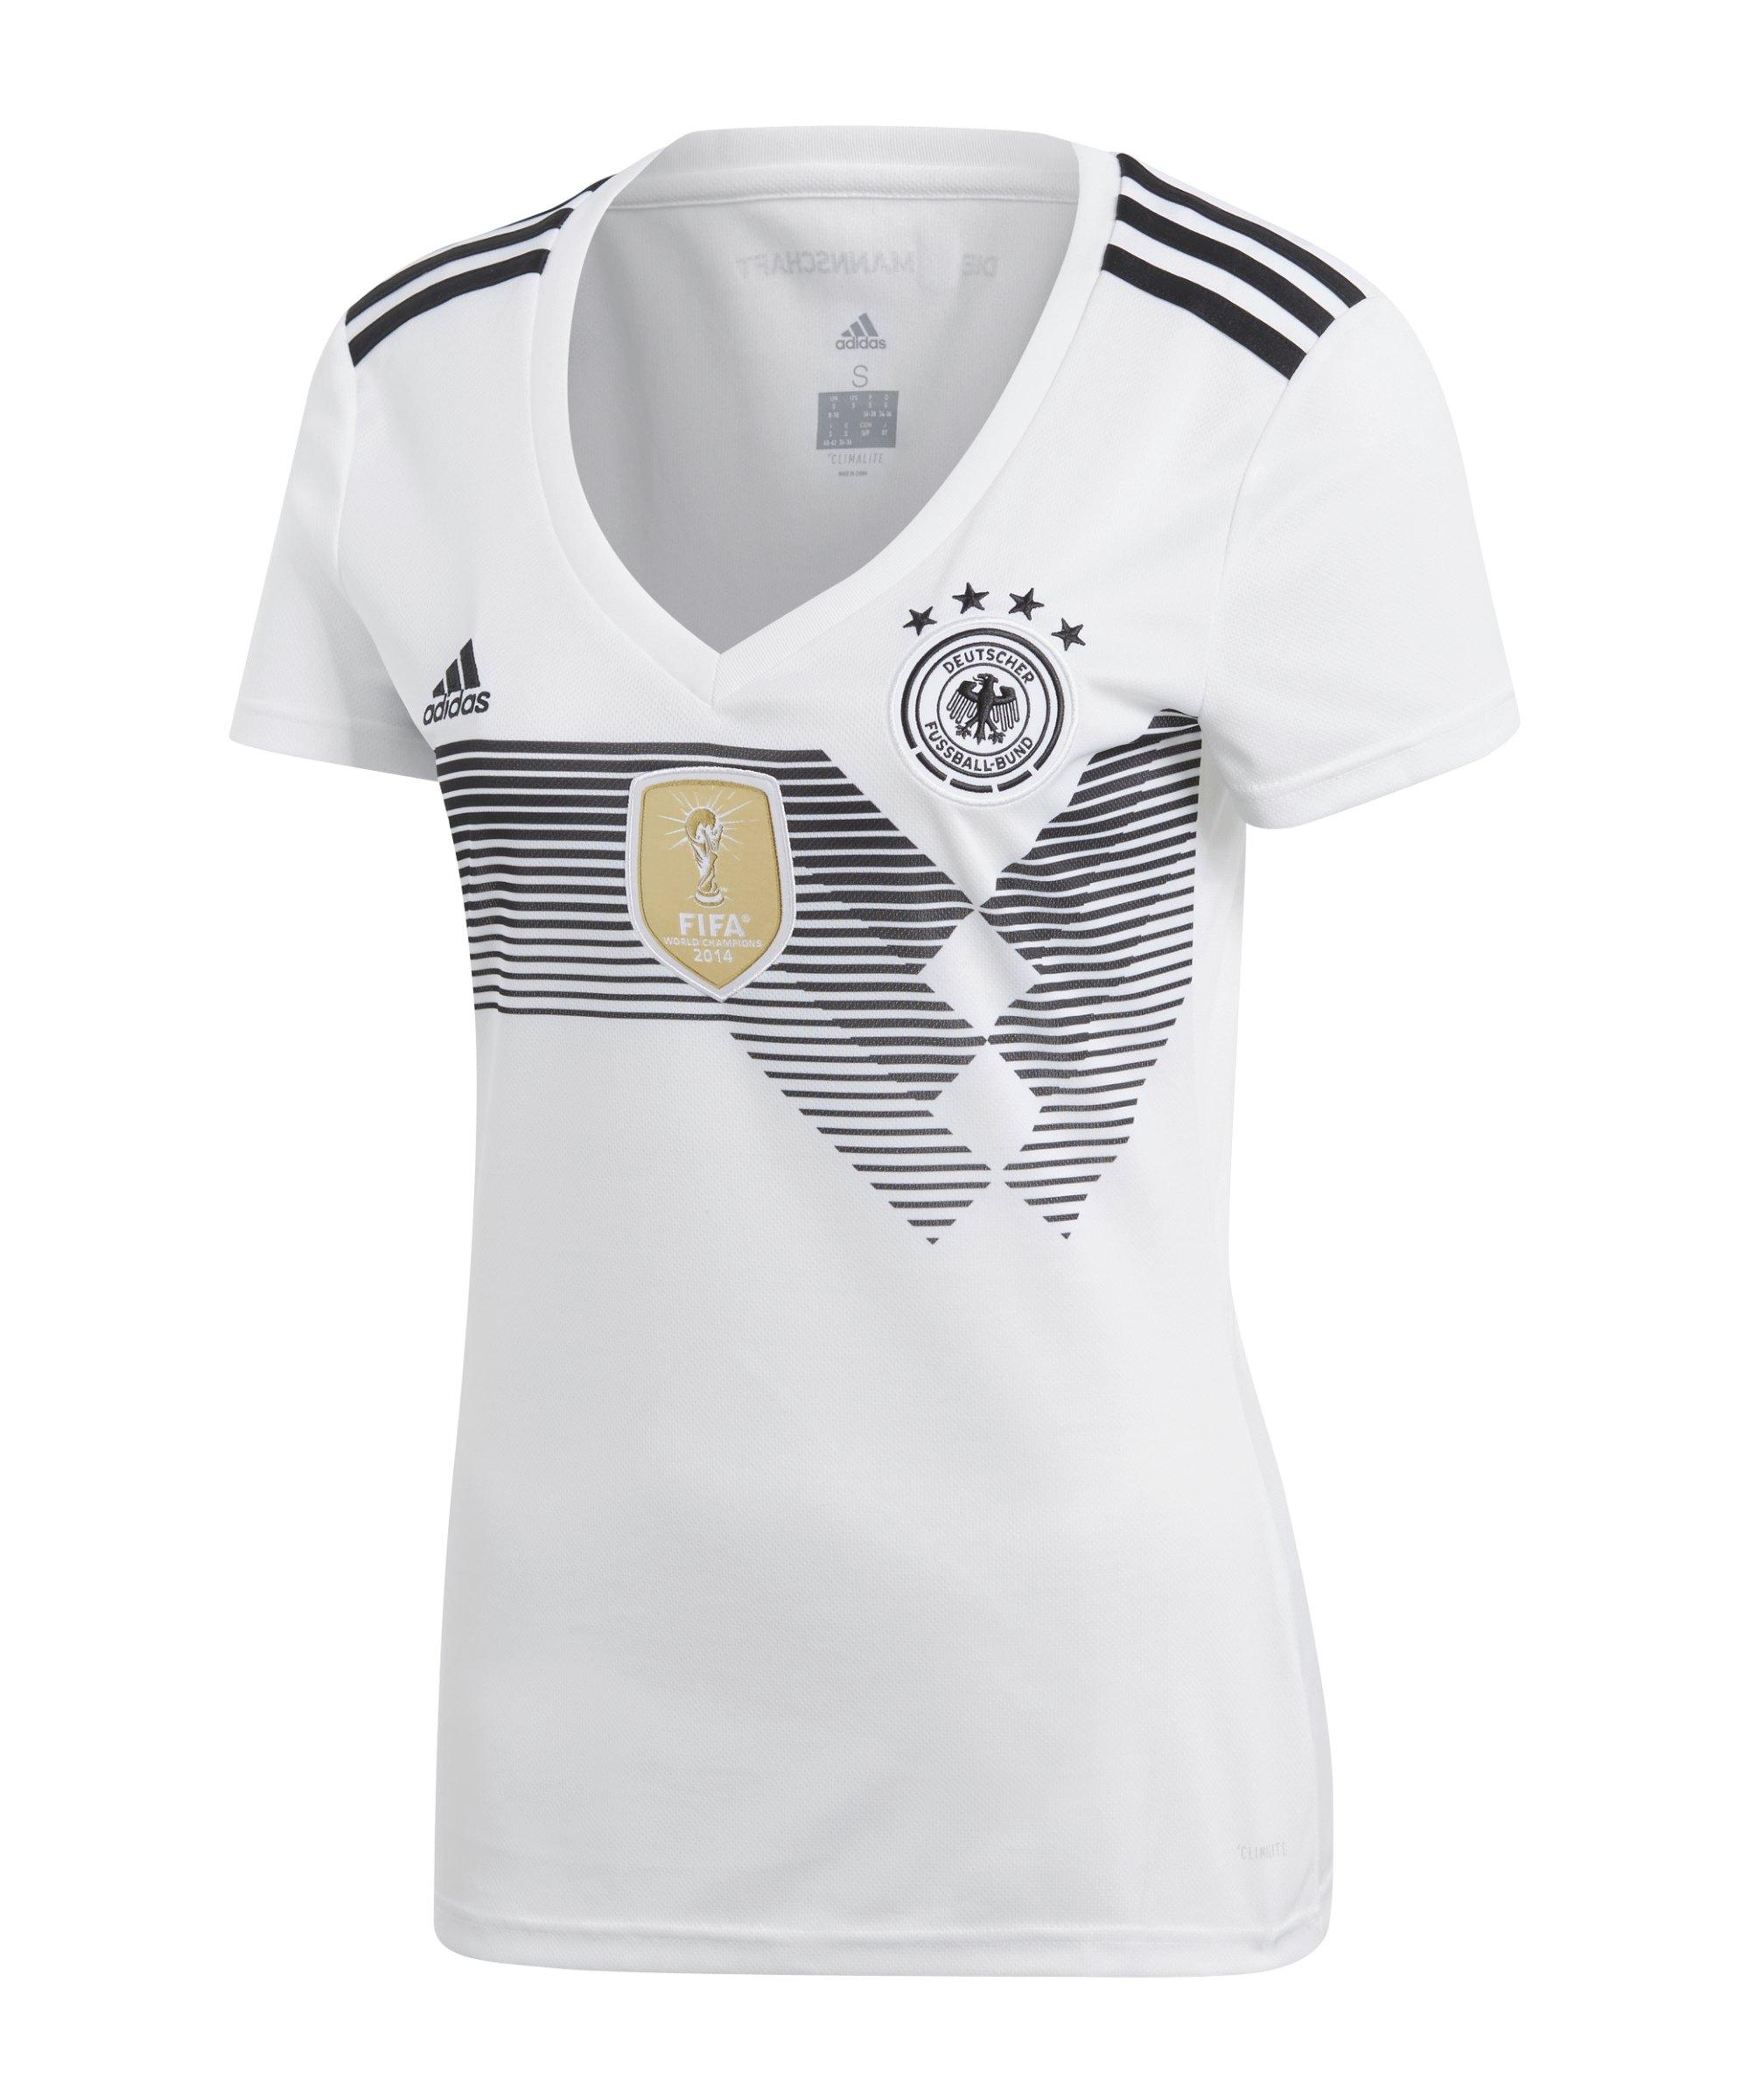 Trikot Weiss Wm18 Damen H Adidas Dfb Deutschland nkX8PN0wO